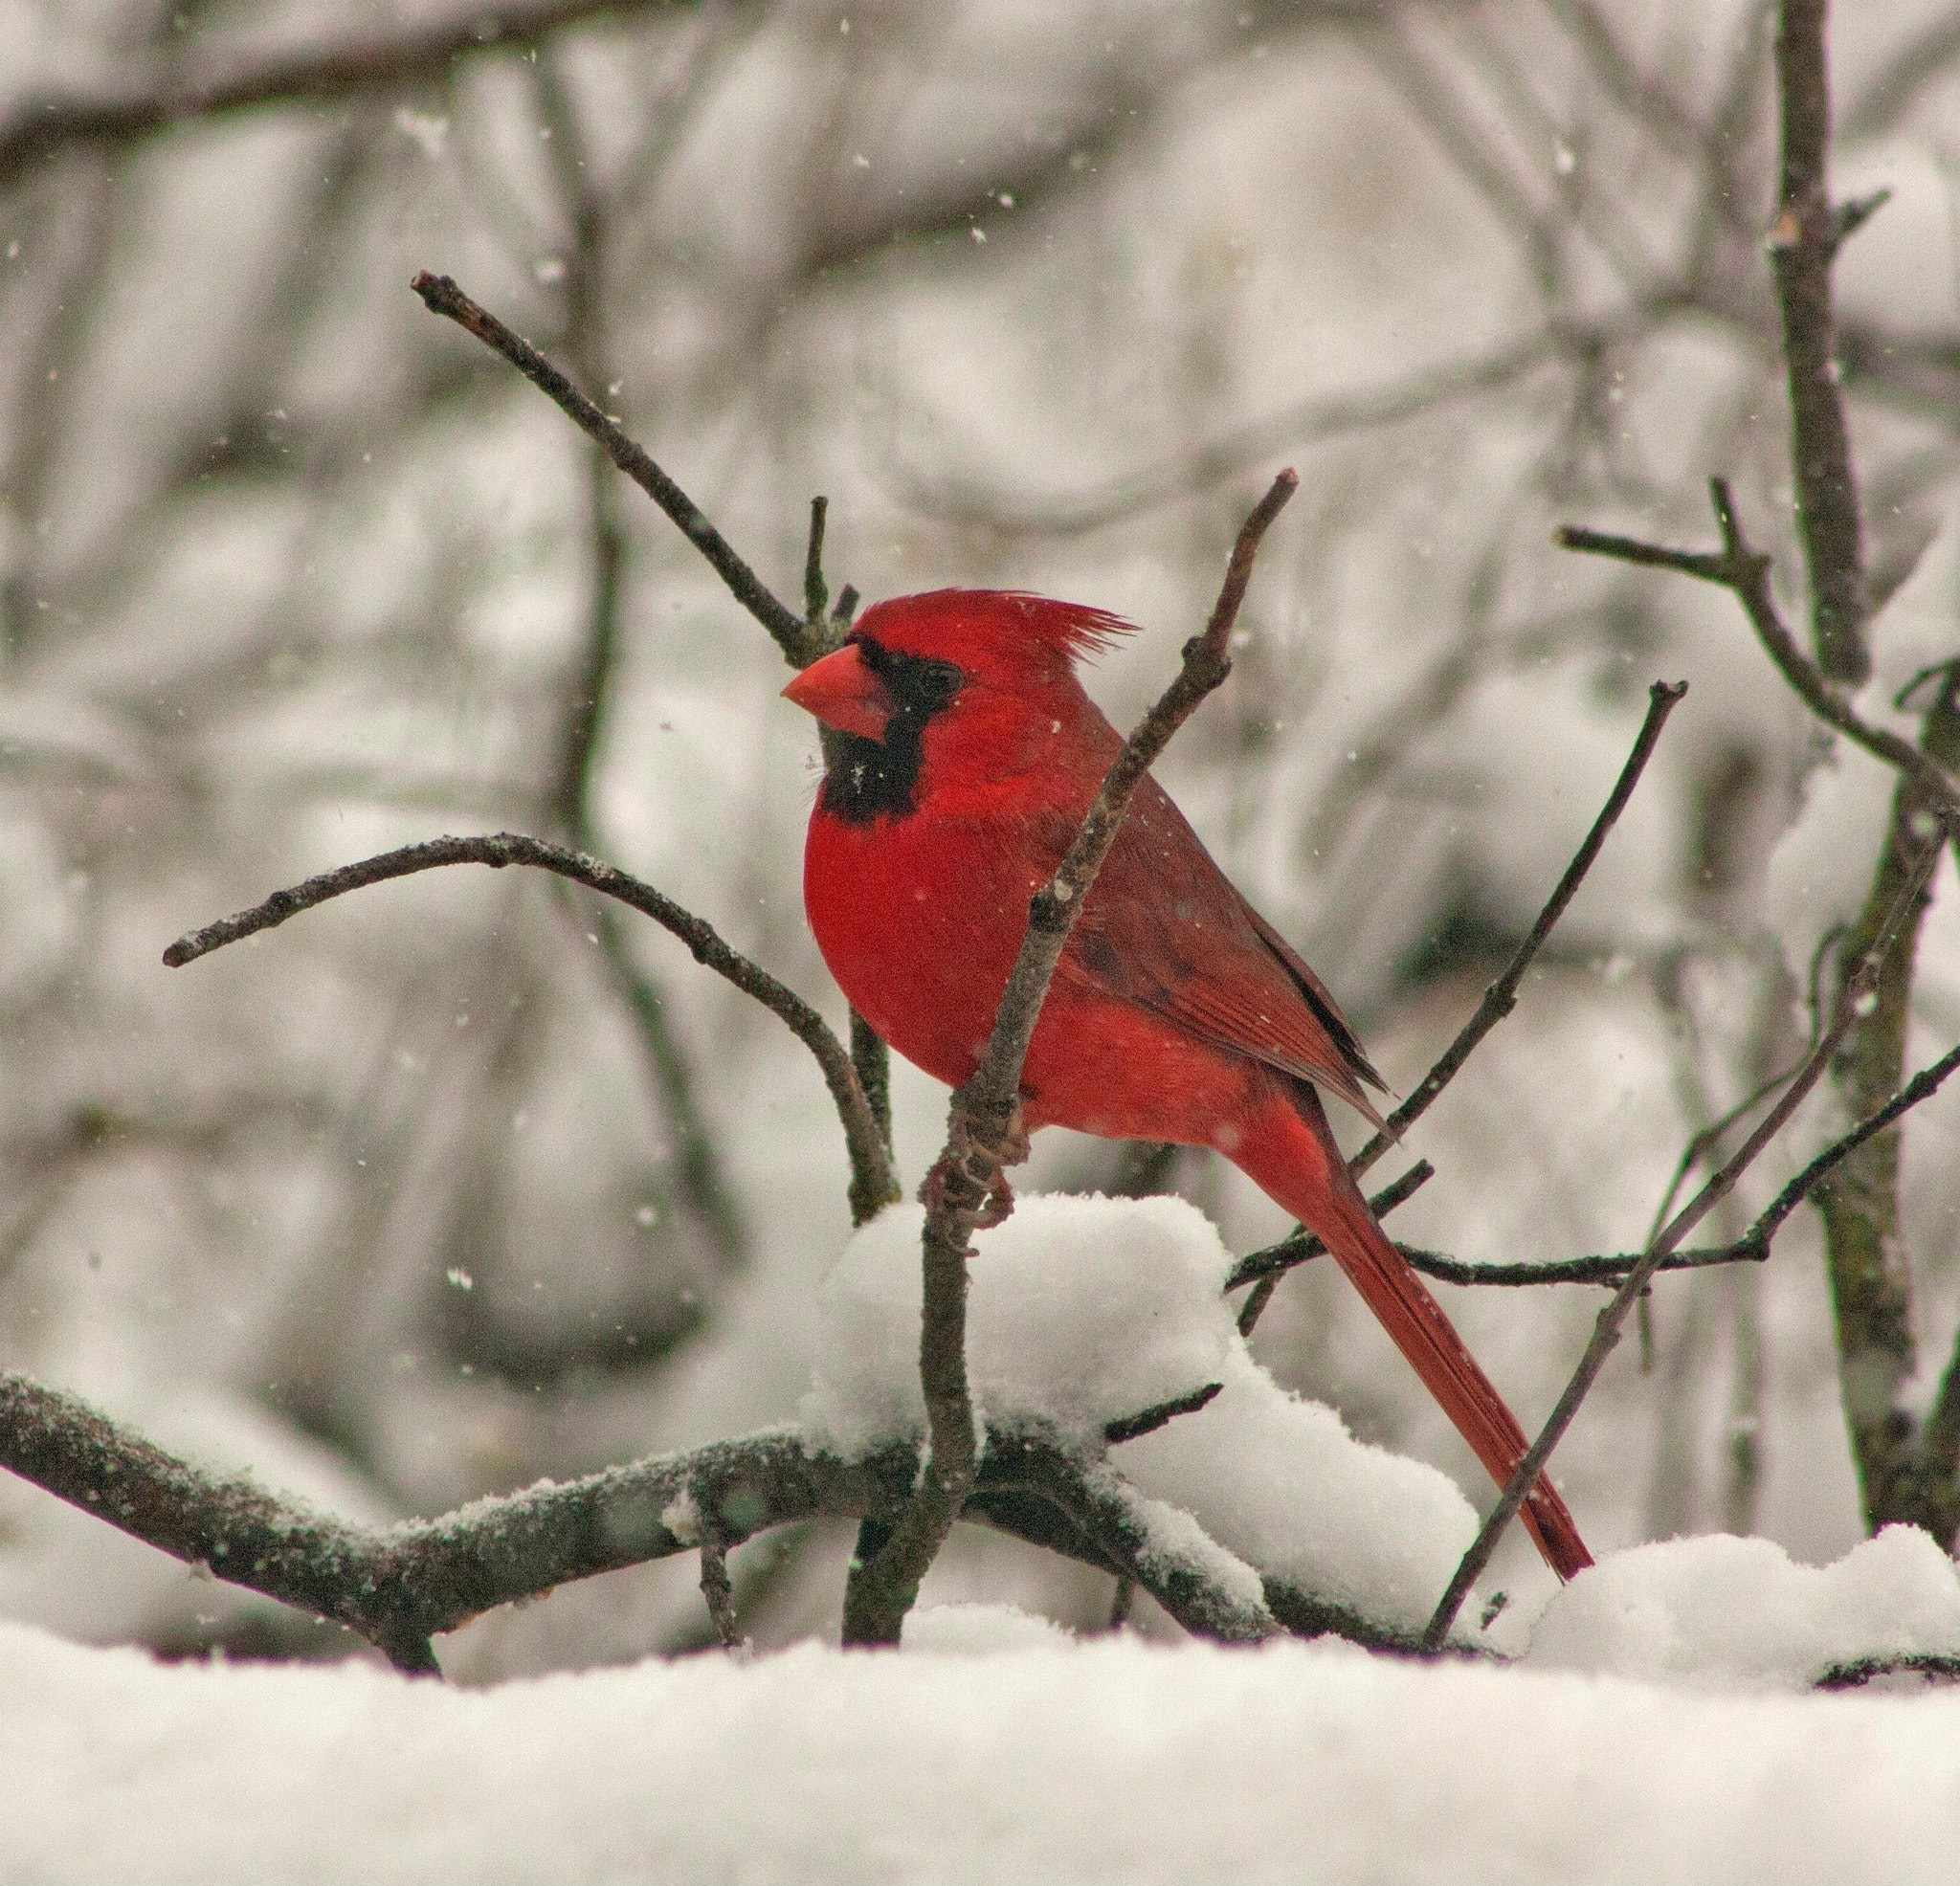 The Cardinals snow stories